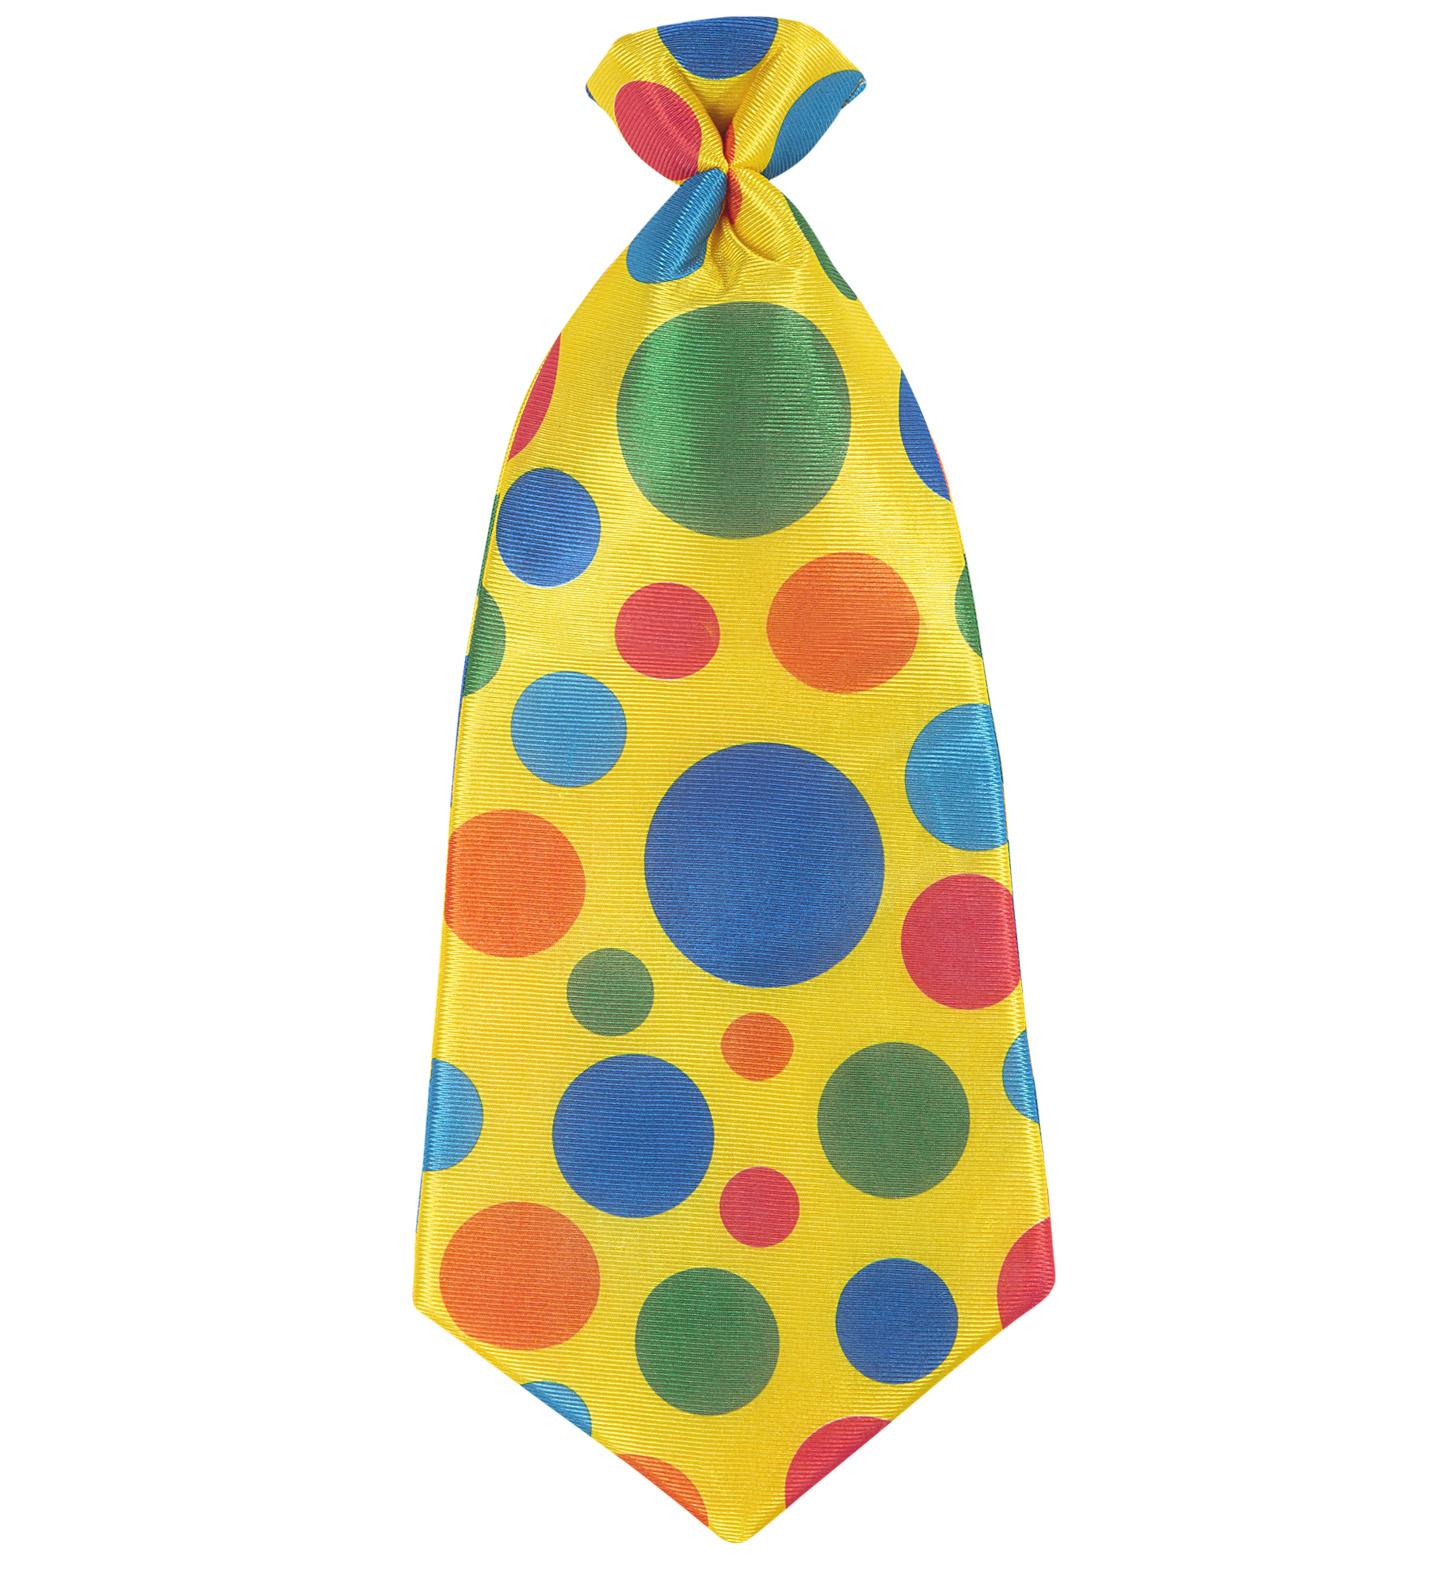 Maxi Clown Tie Necktie Circus Fancy Dress